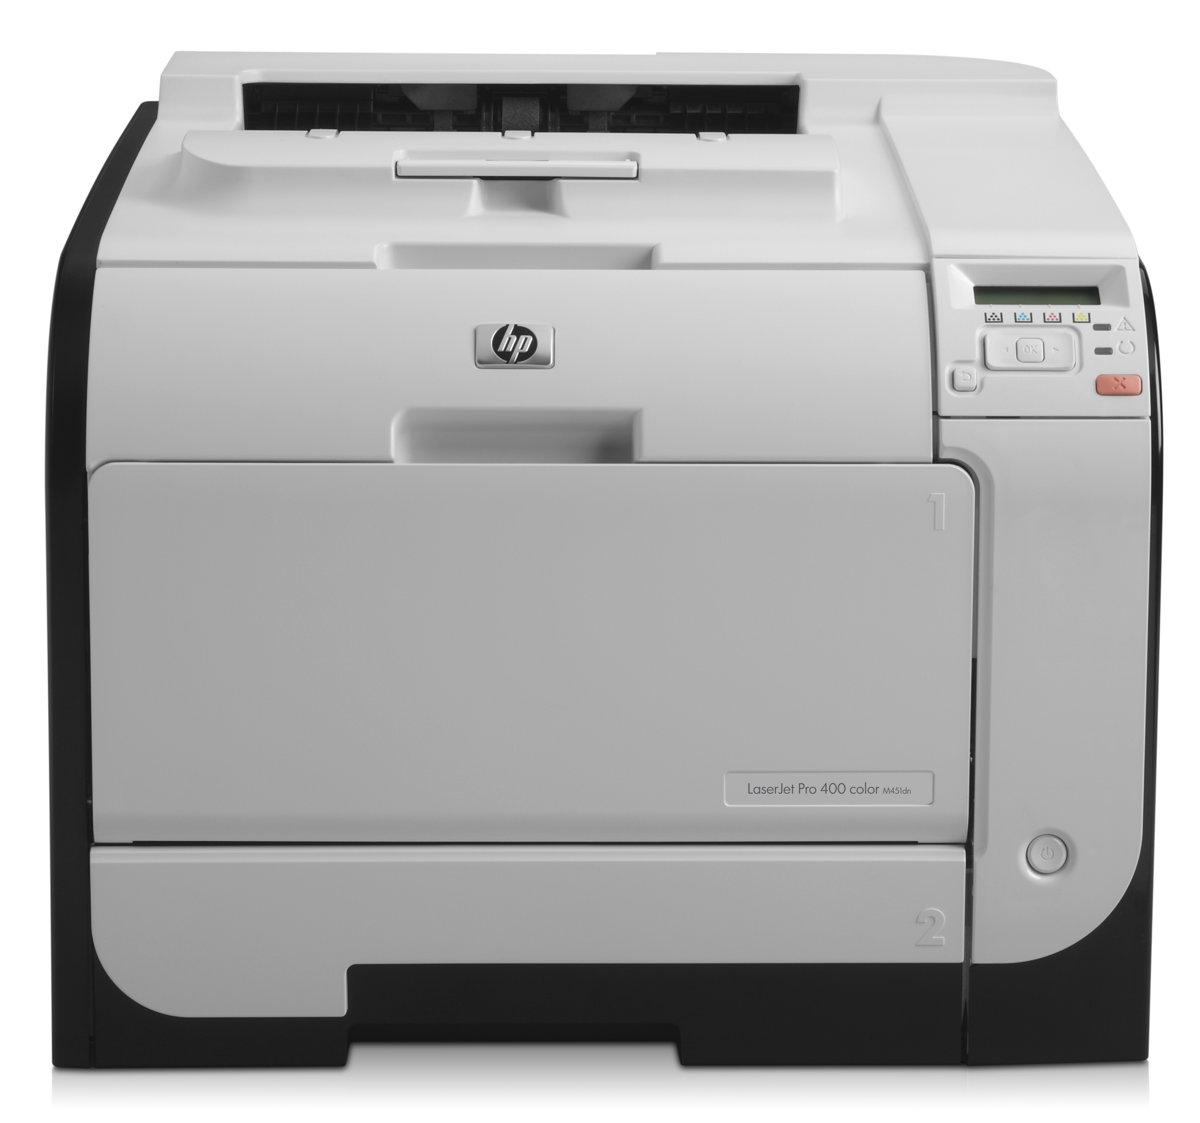 Office depot color printing costs - Hp Laserjet Pro 400 Color M451dn Color Printer By Office Depot Officemax